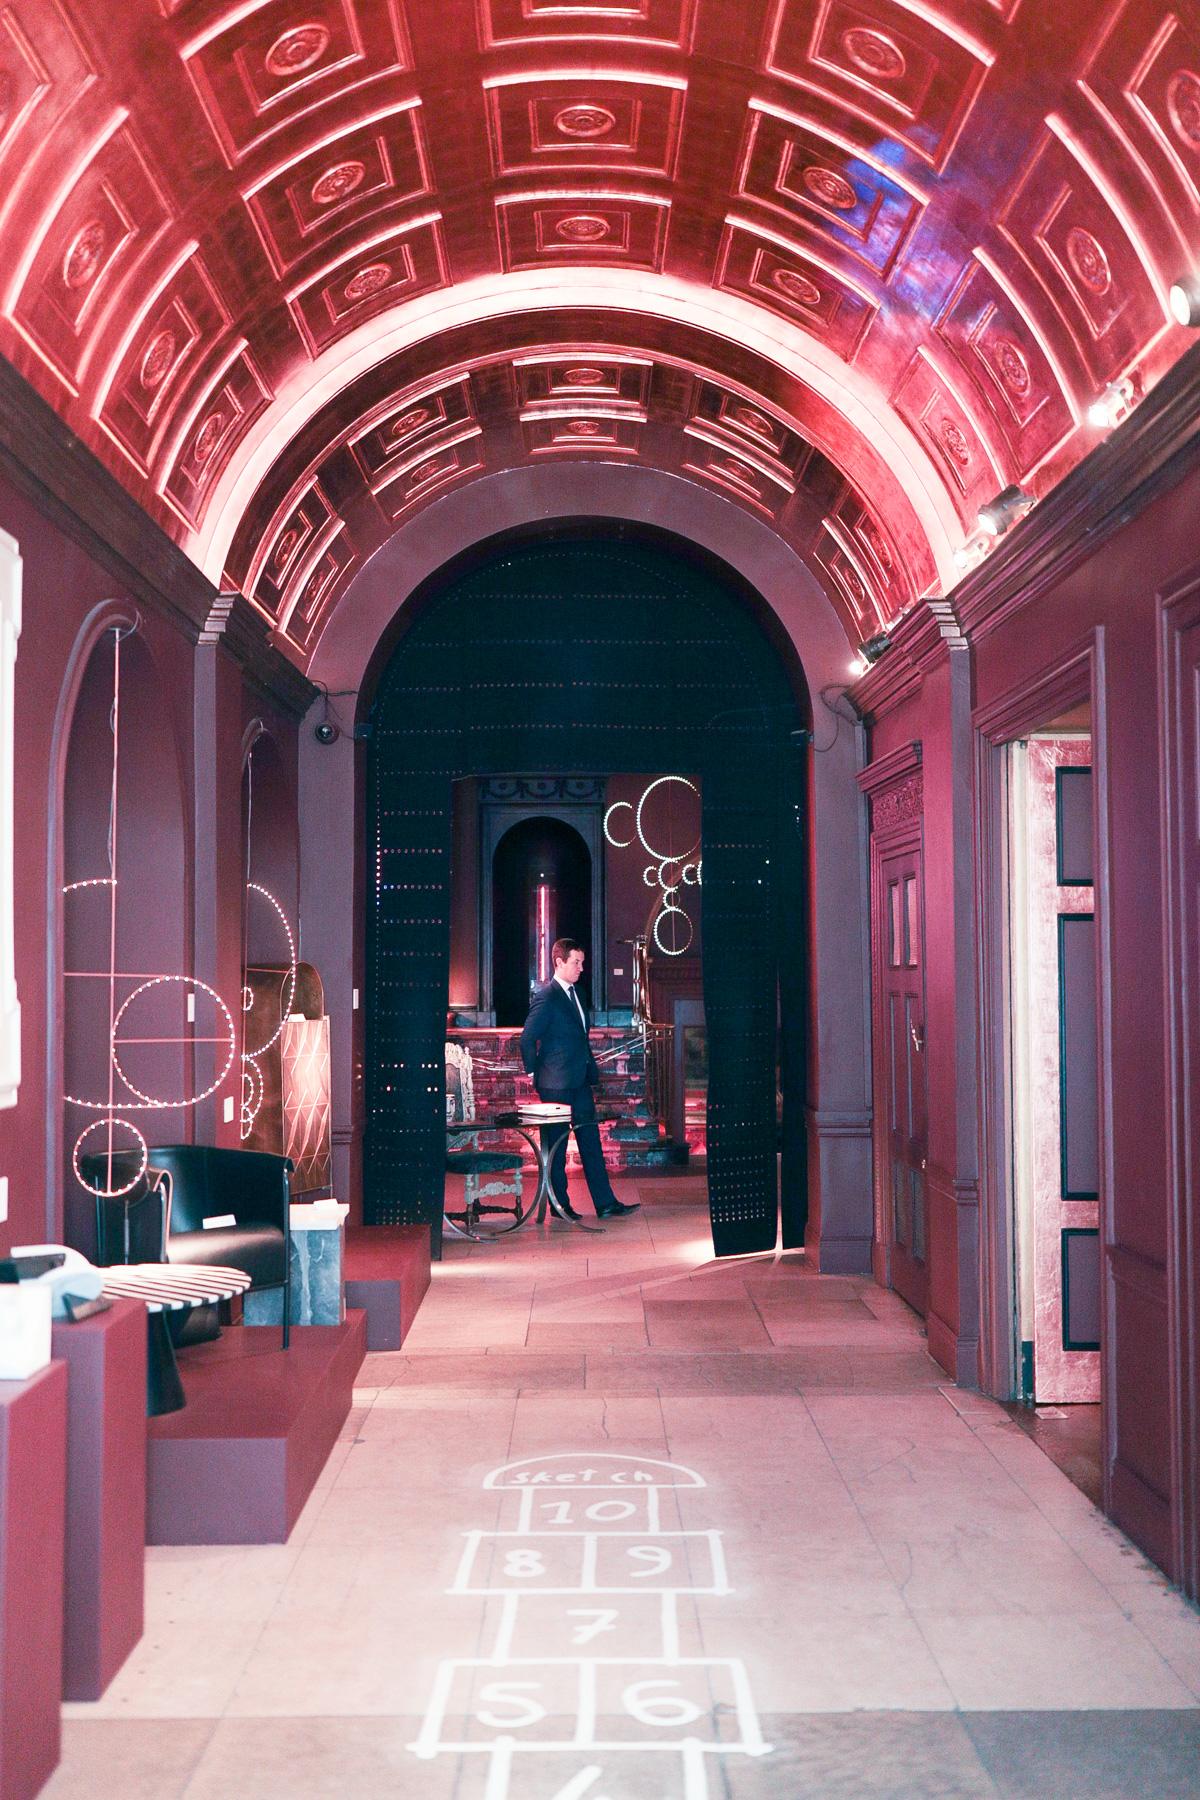 Room Sketching: Sketch London Pink Tea Room The Glade-26538